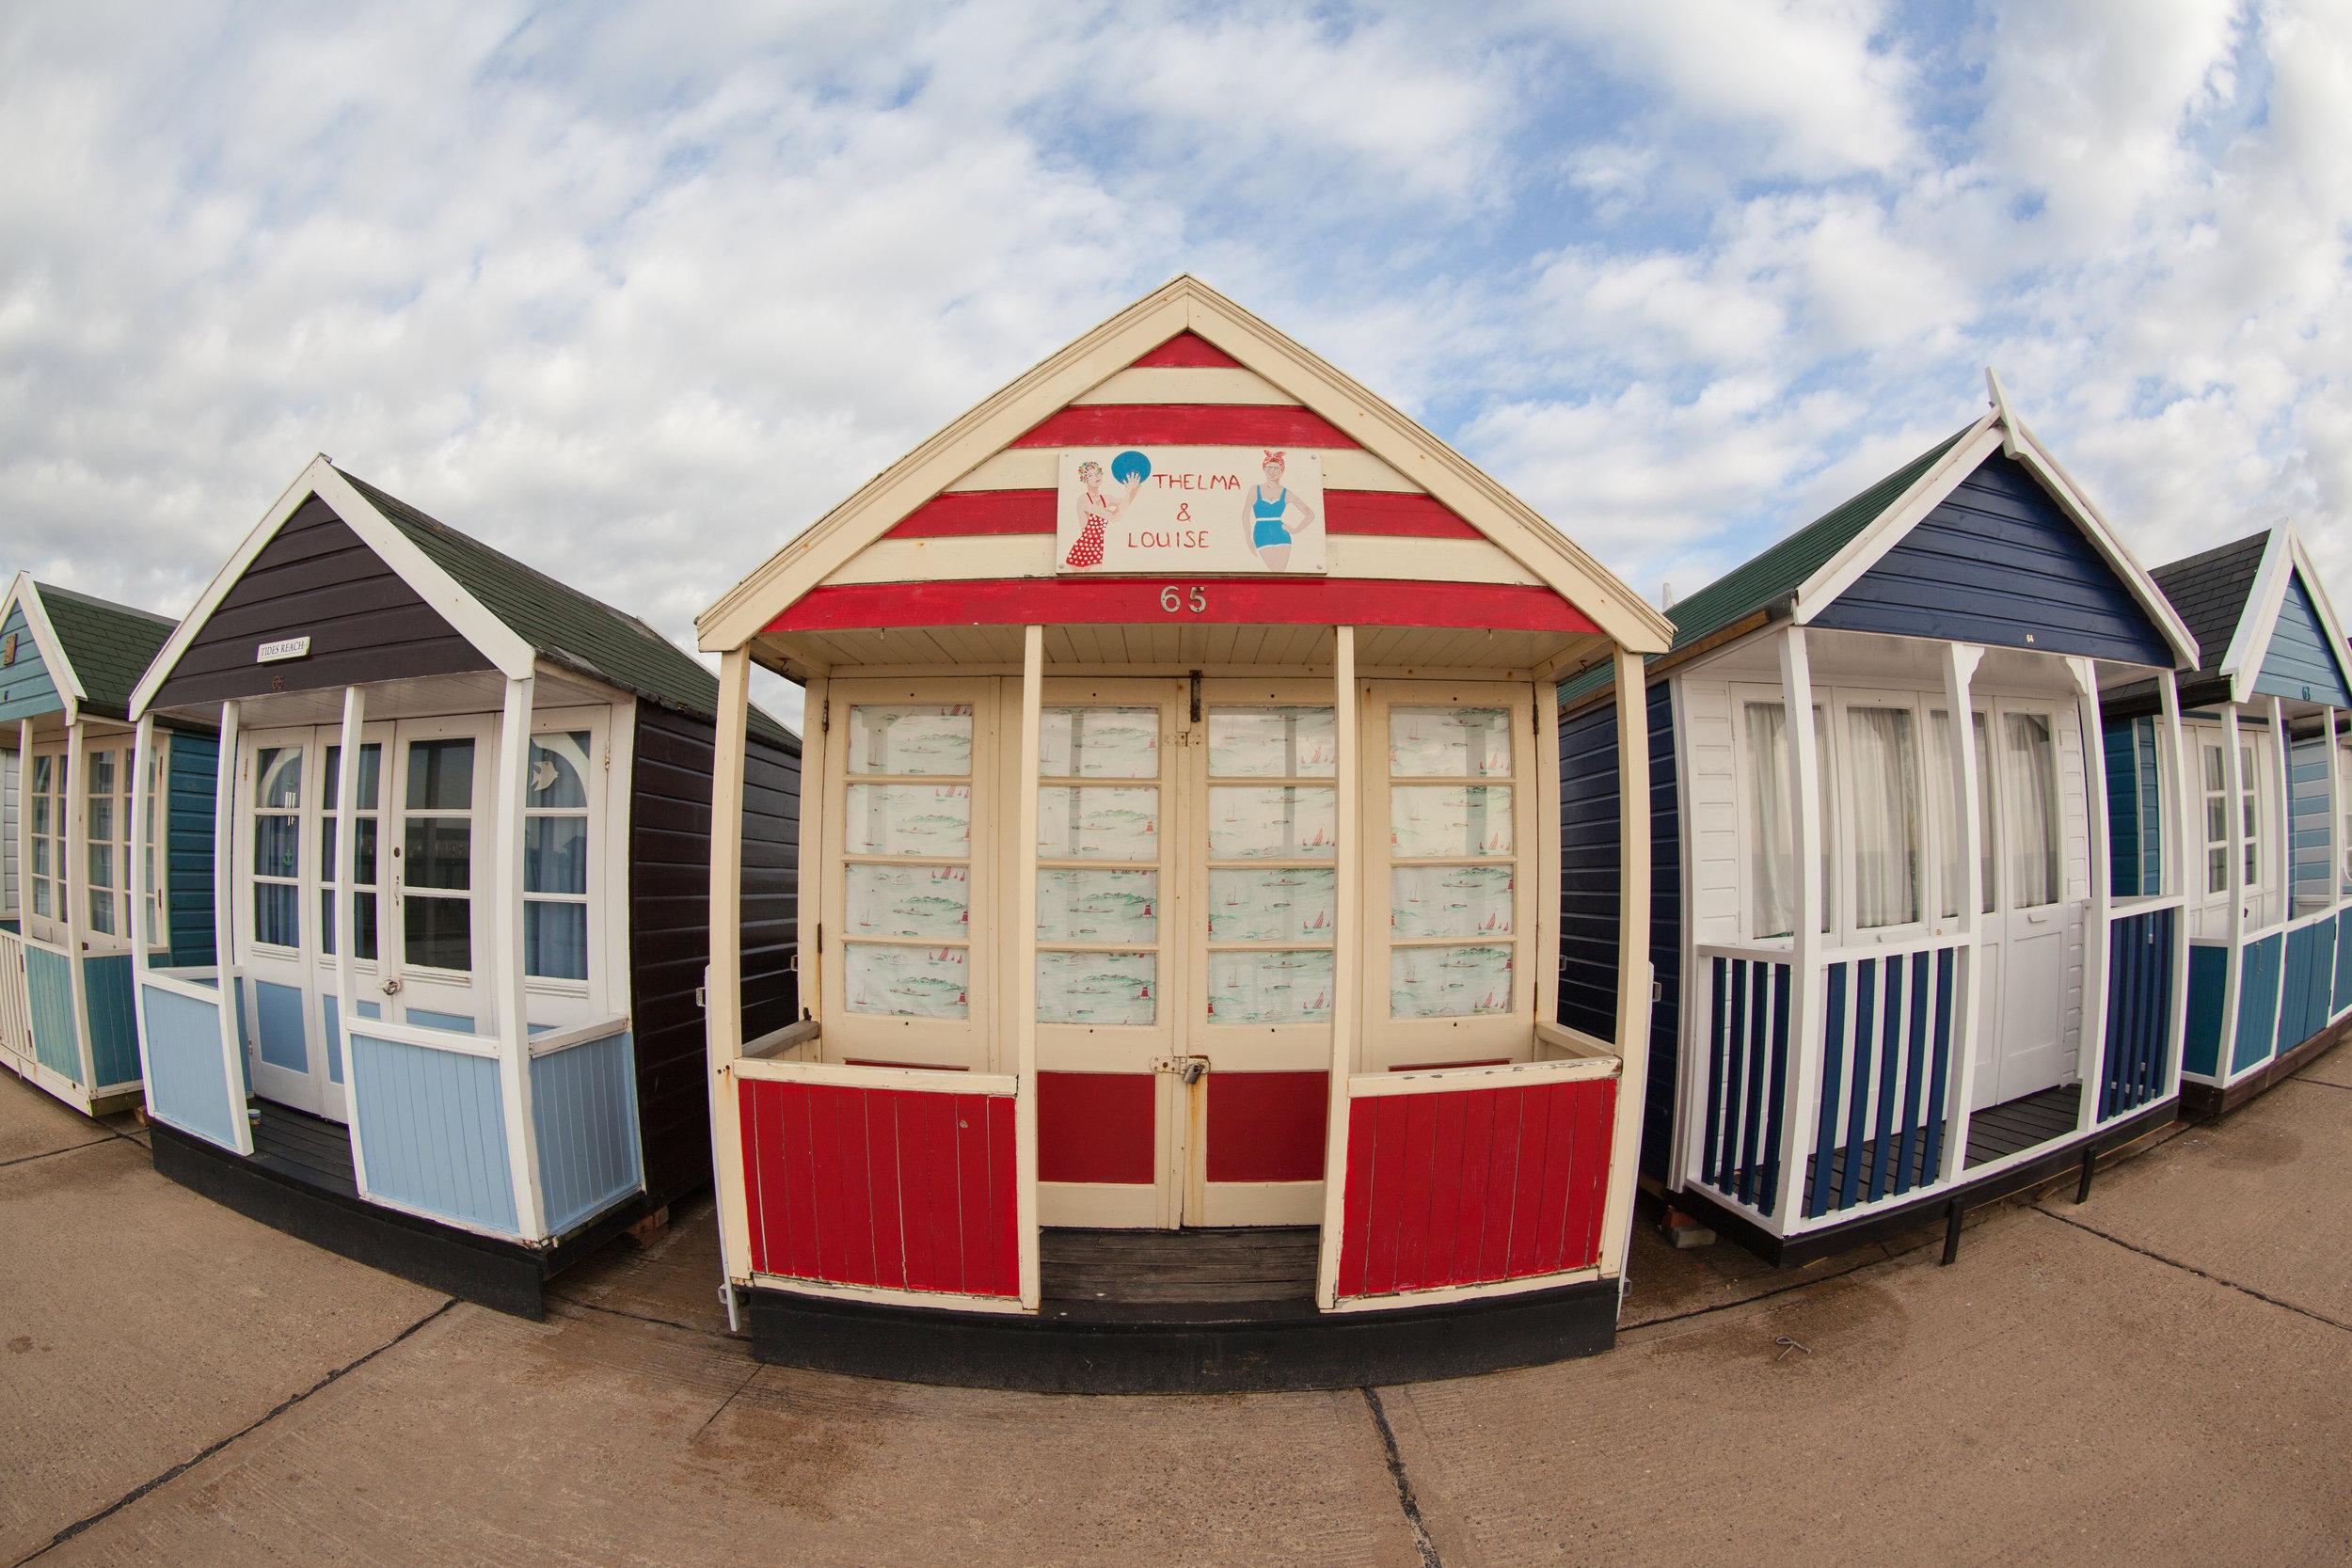 Traditional English beach huts at Southwold.